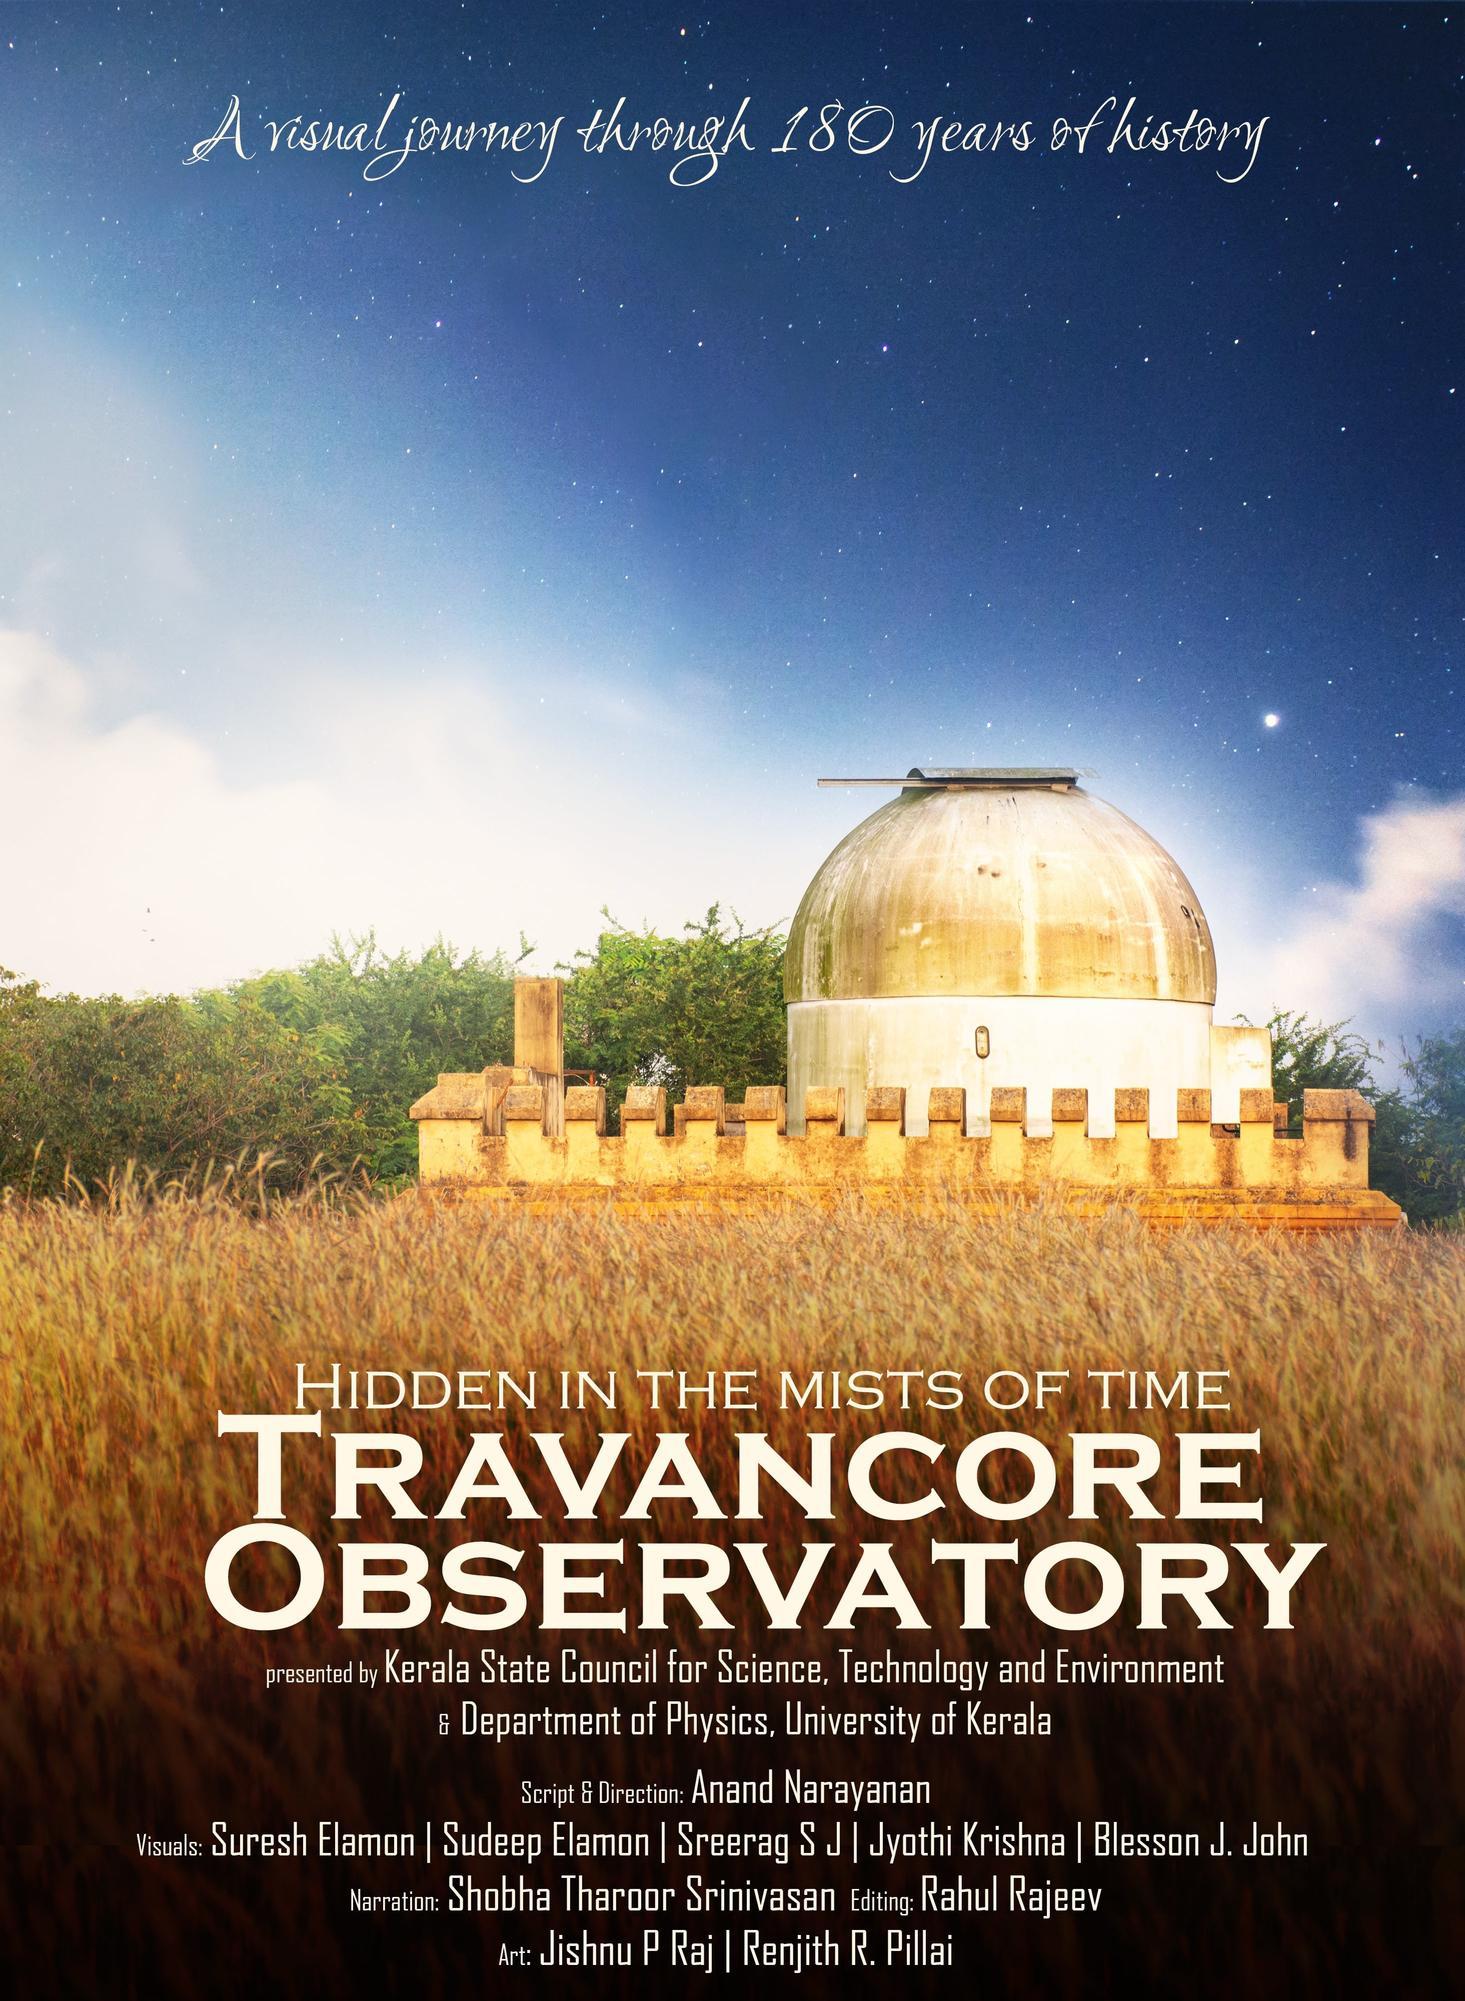 Travancore Observatory